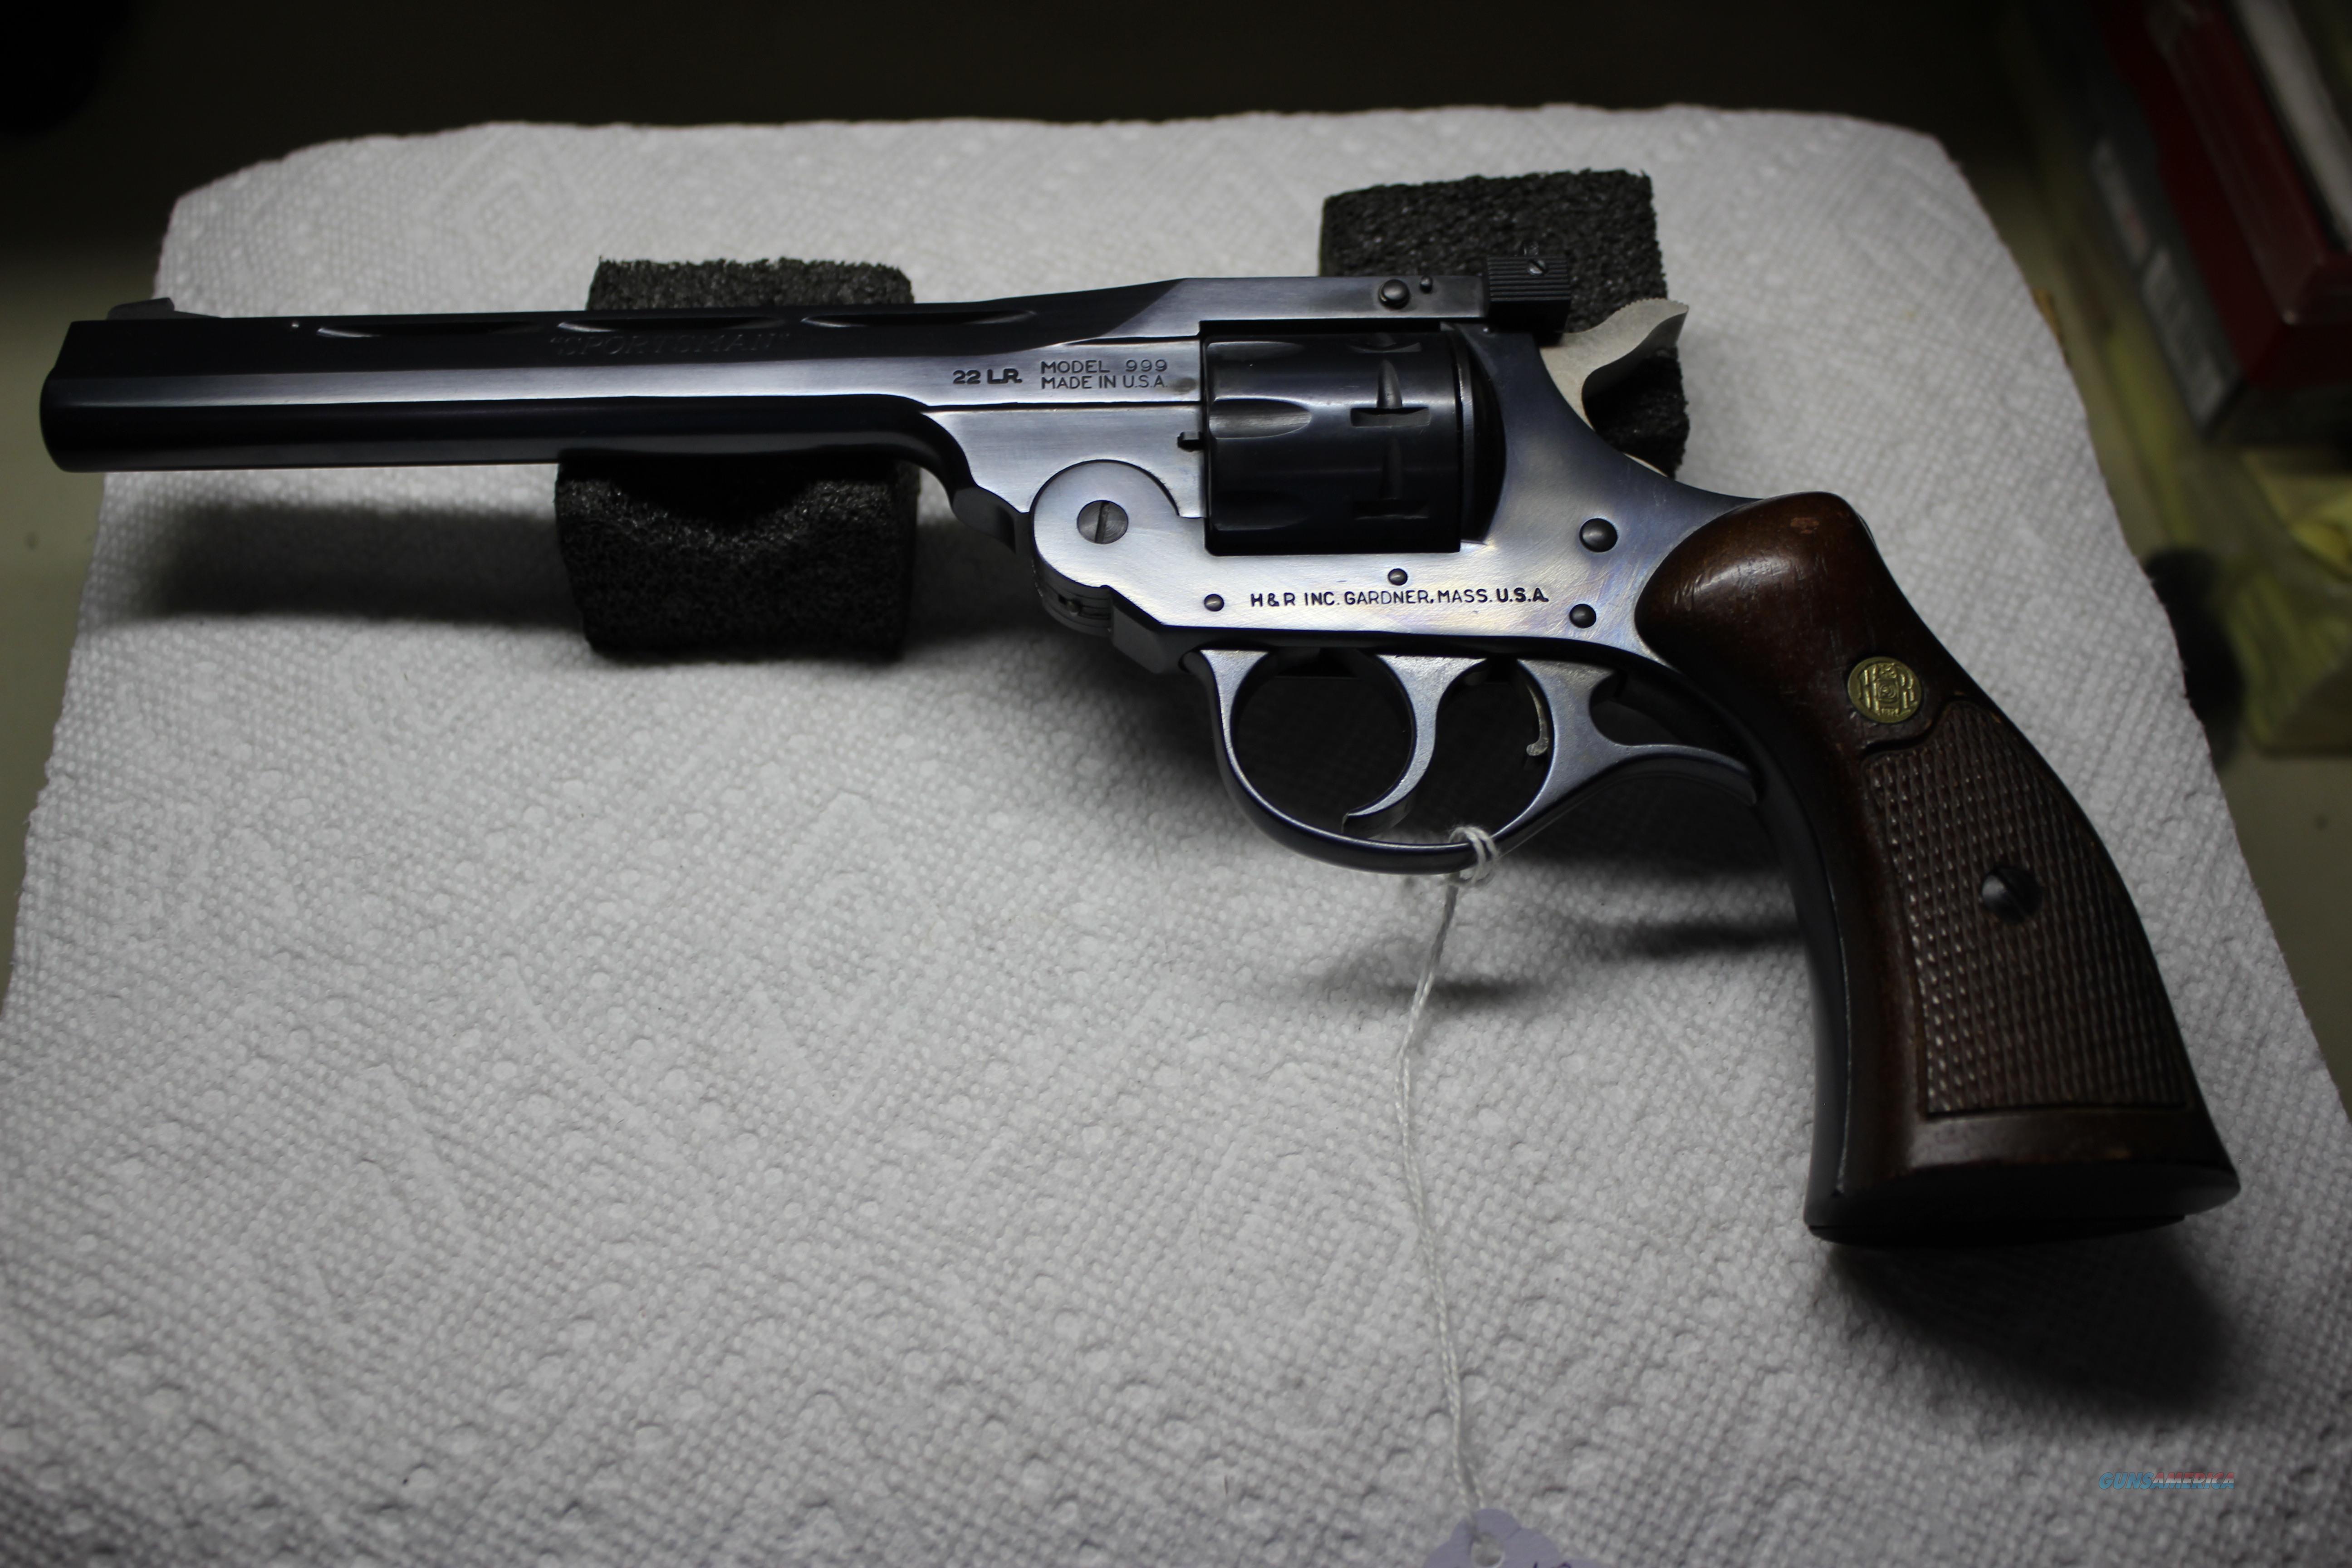 H&R SPORTSMAN 999  Guns > Pistols > Harrington & Richardson Pistols